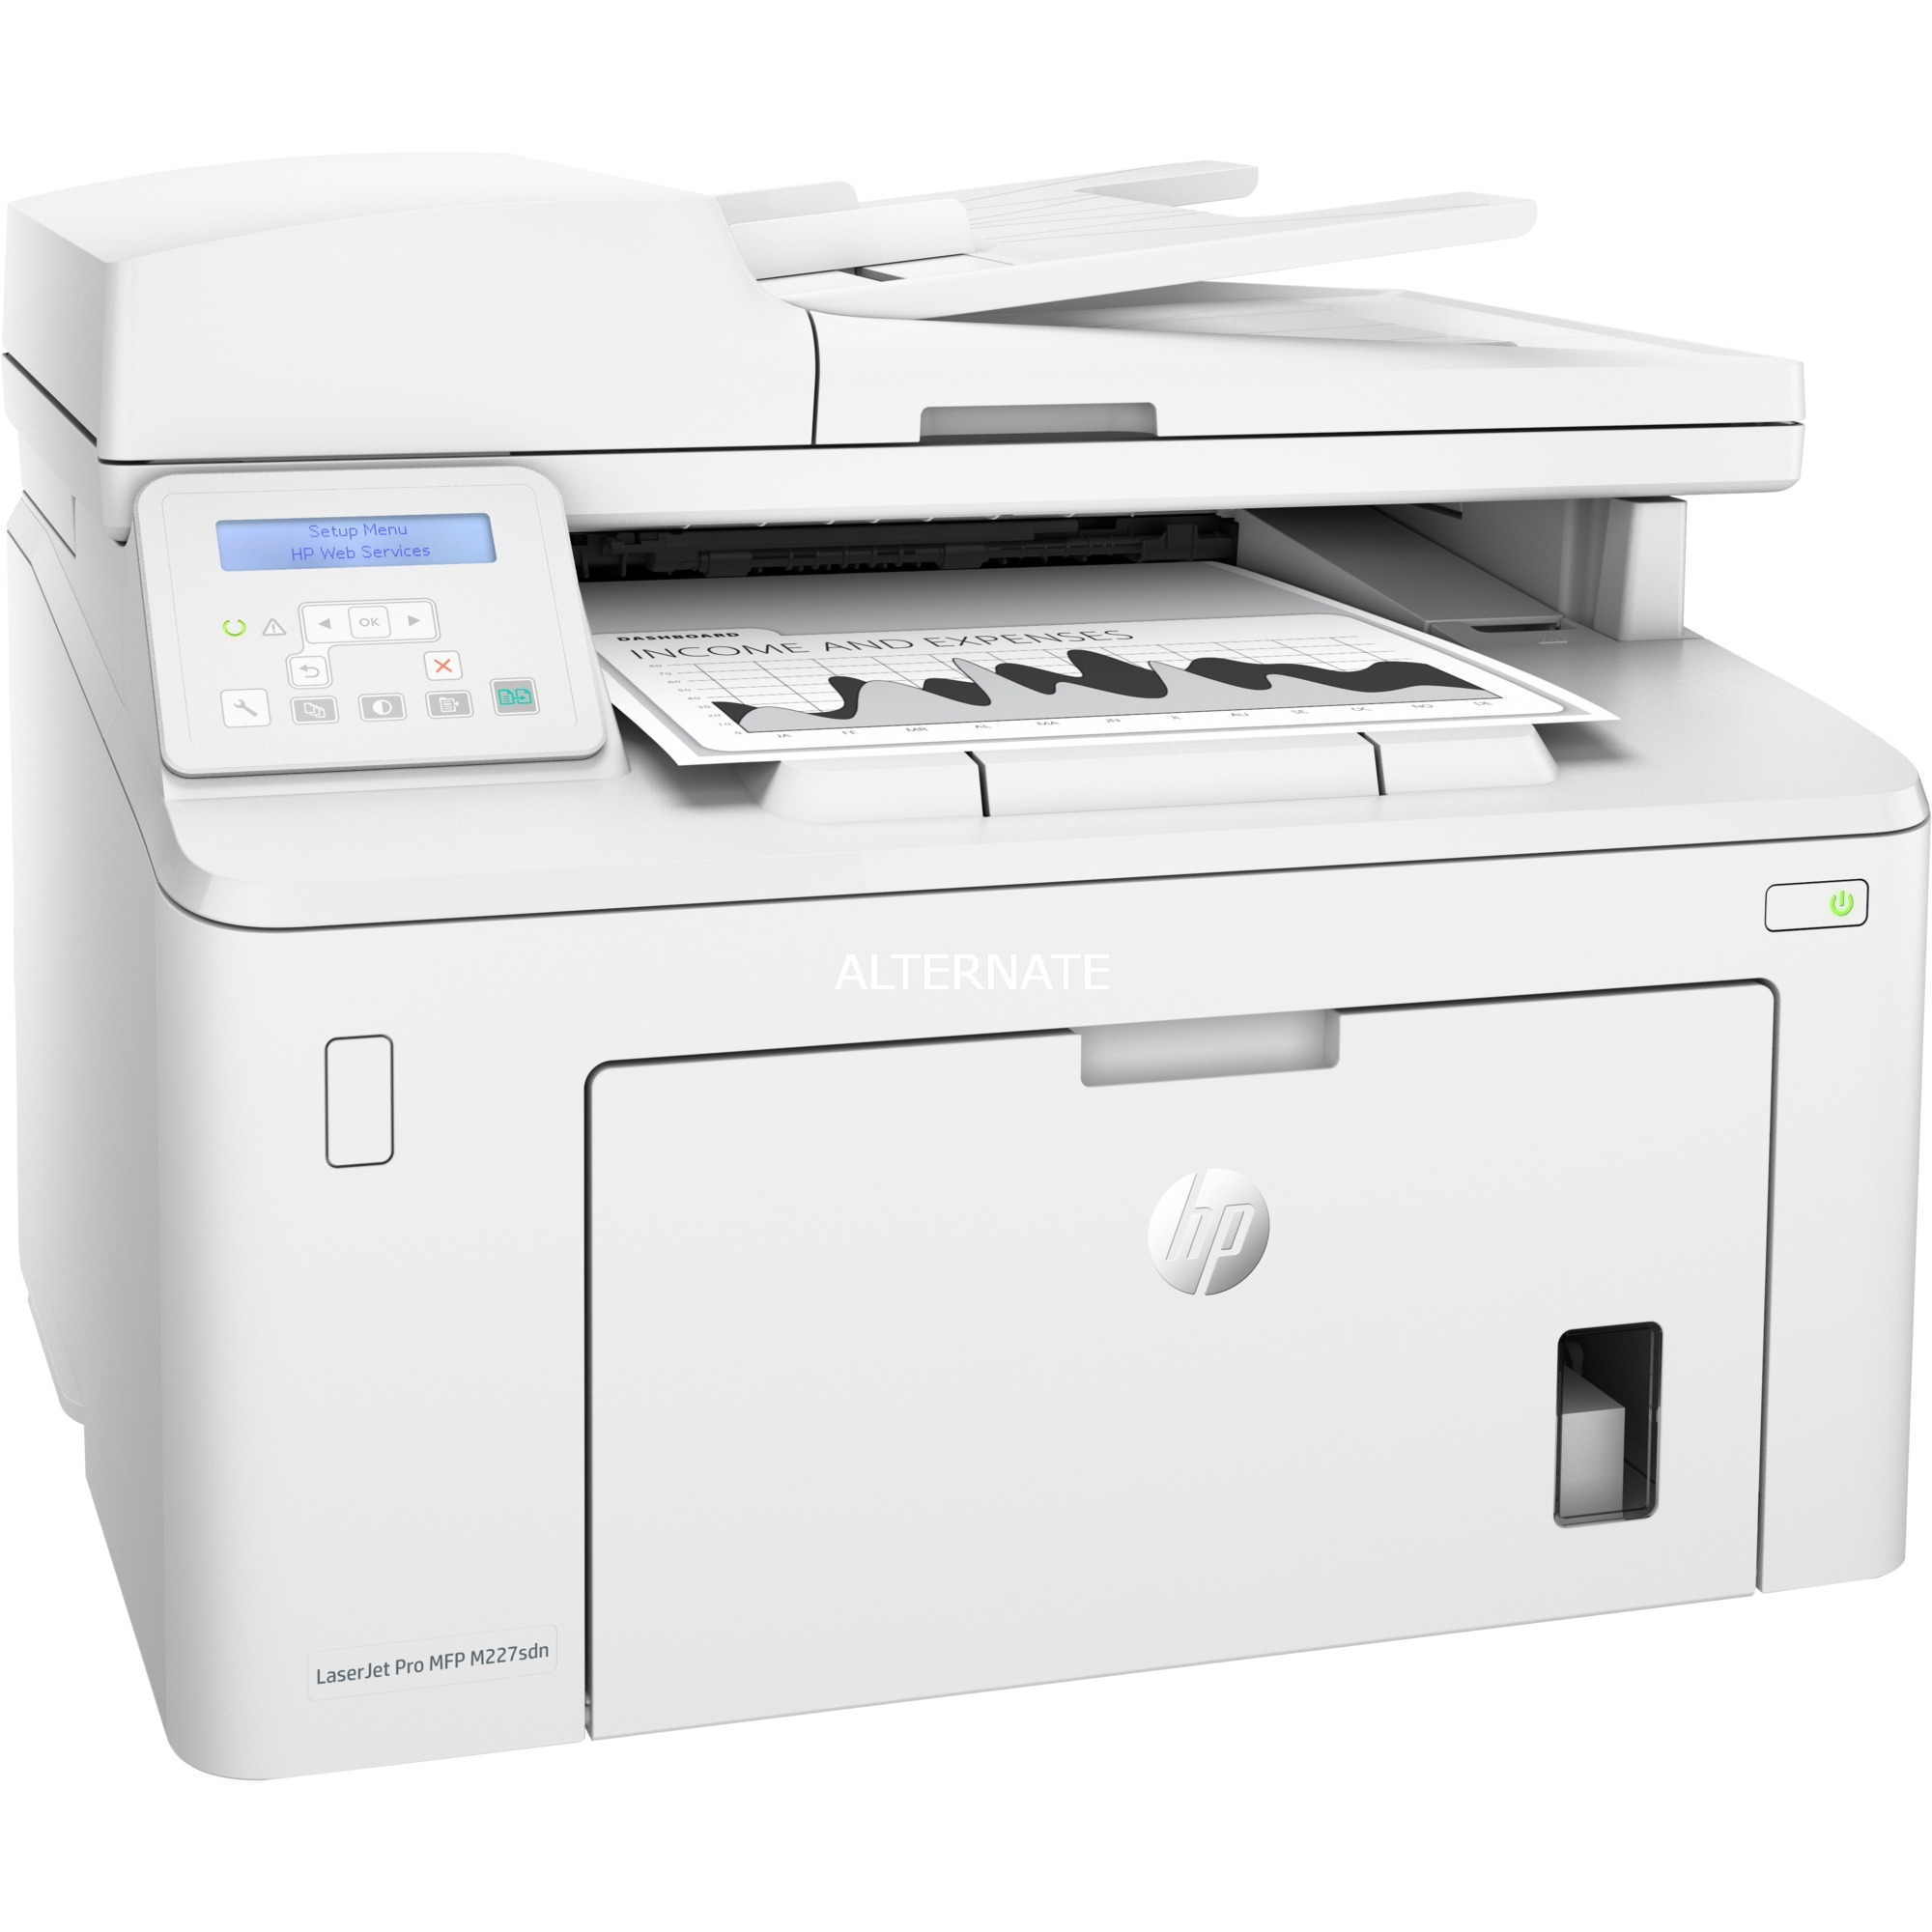 LaserJet Pro M227sdn Laser 28 ppm 1200 x 1200 DPI A4, Impresora multifuncional